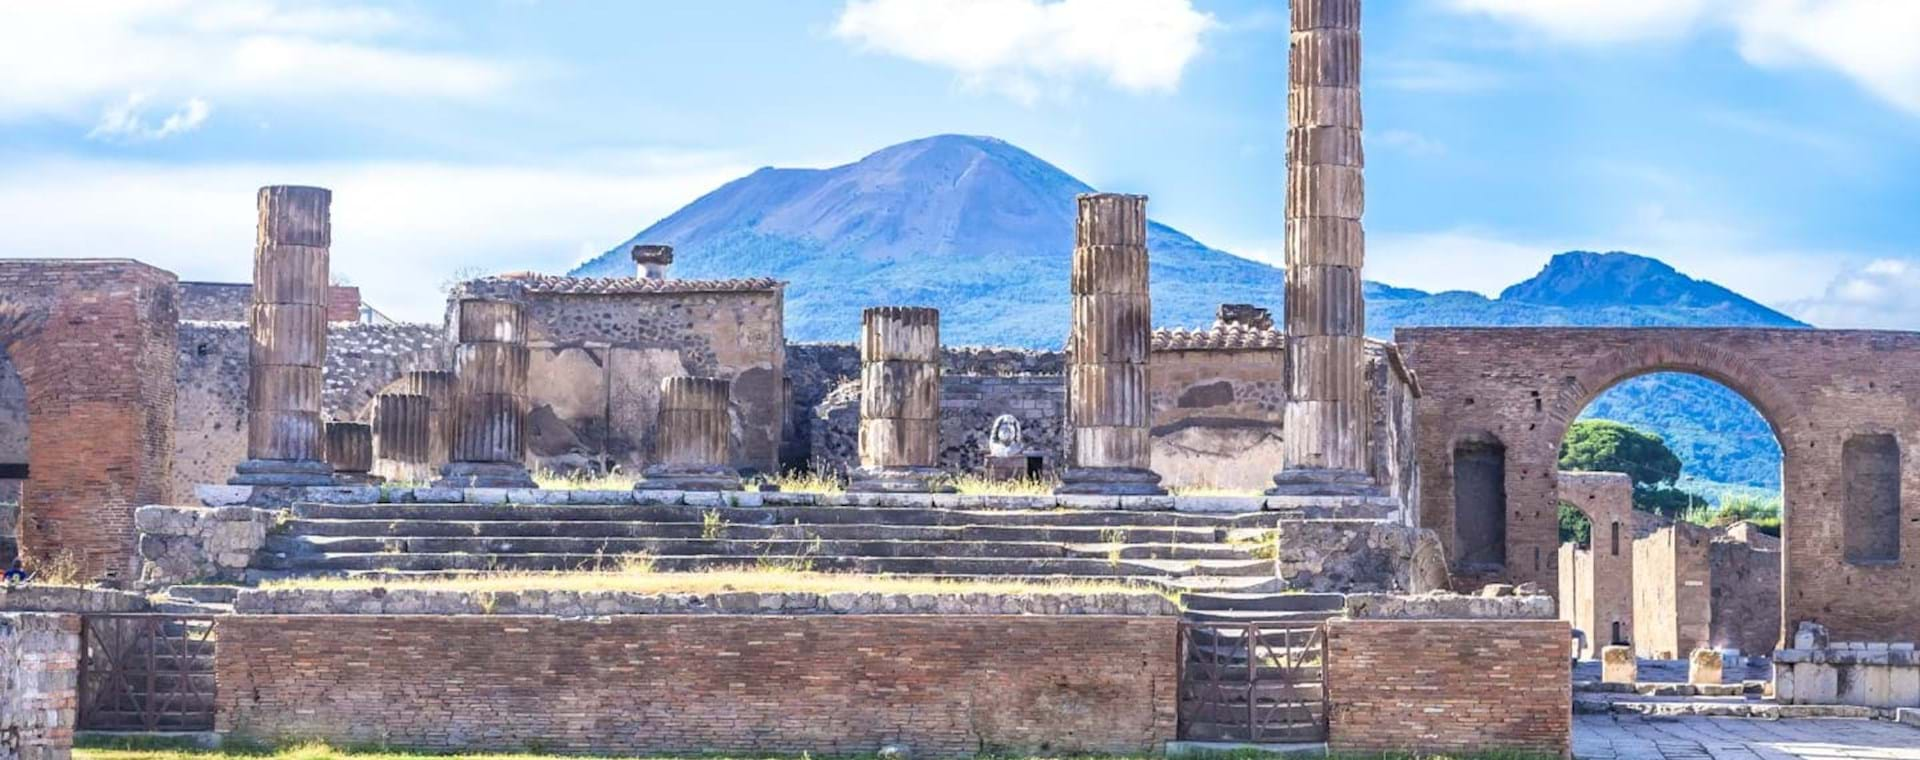 Day Trip: Pompeii & Mt. Vesuvius Volcano from Rome